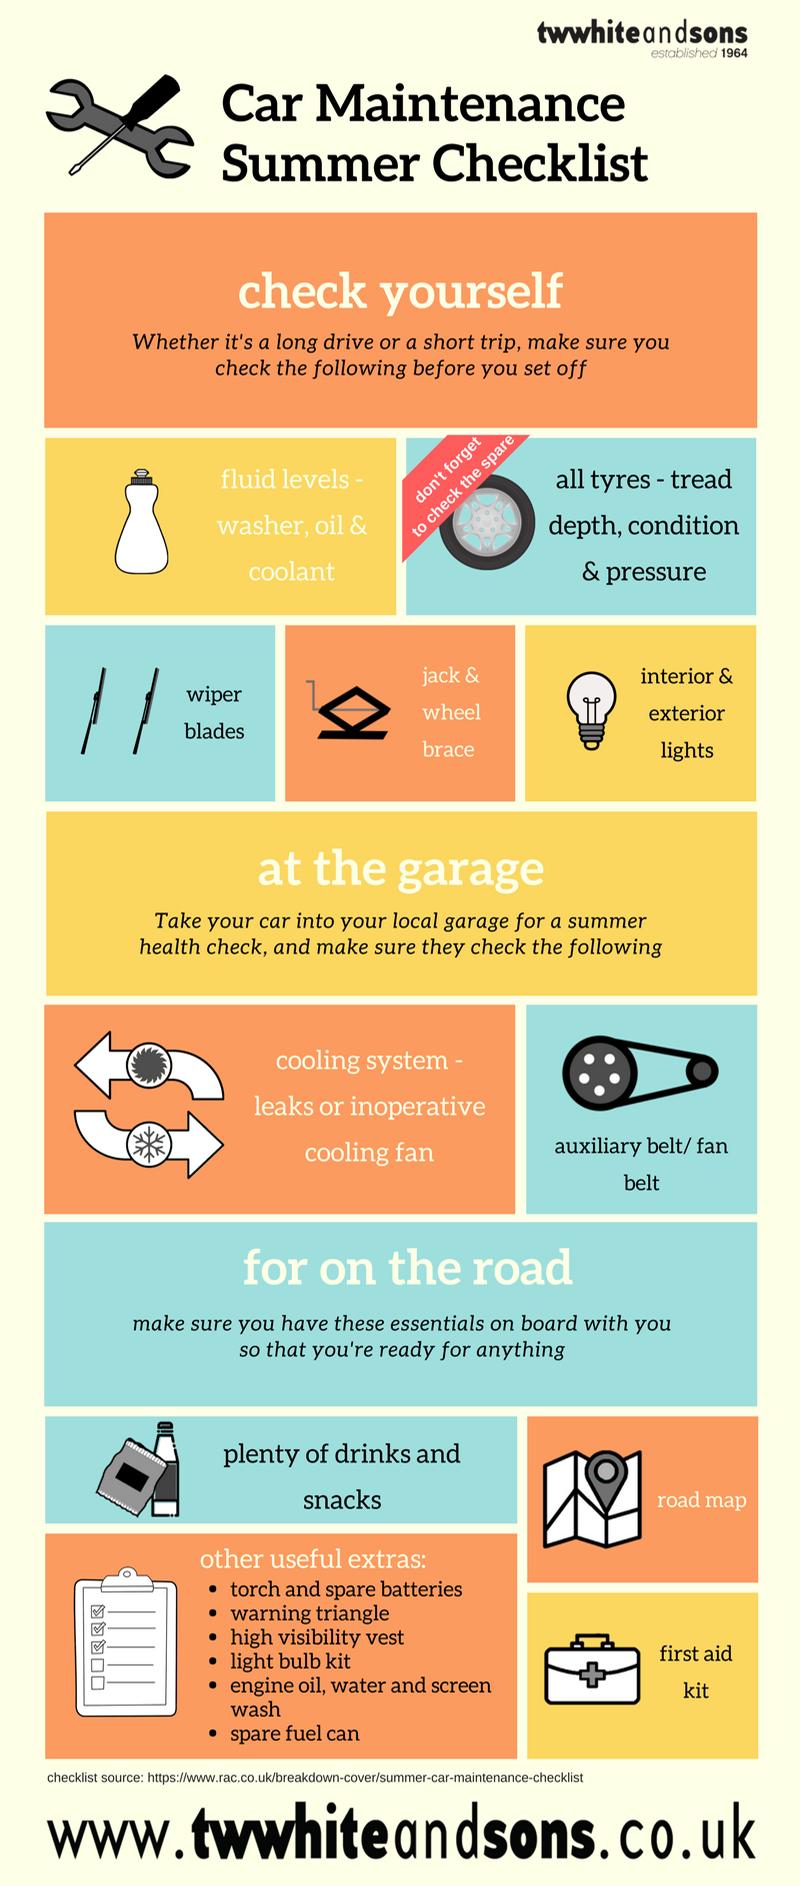 Car Maintenance Summer Checklist Infographic